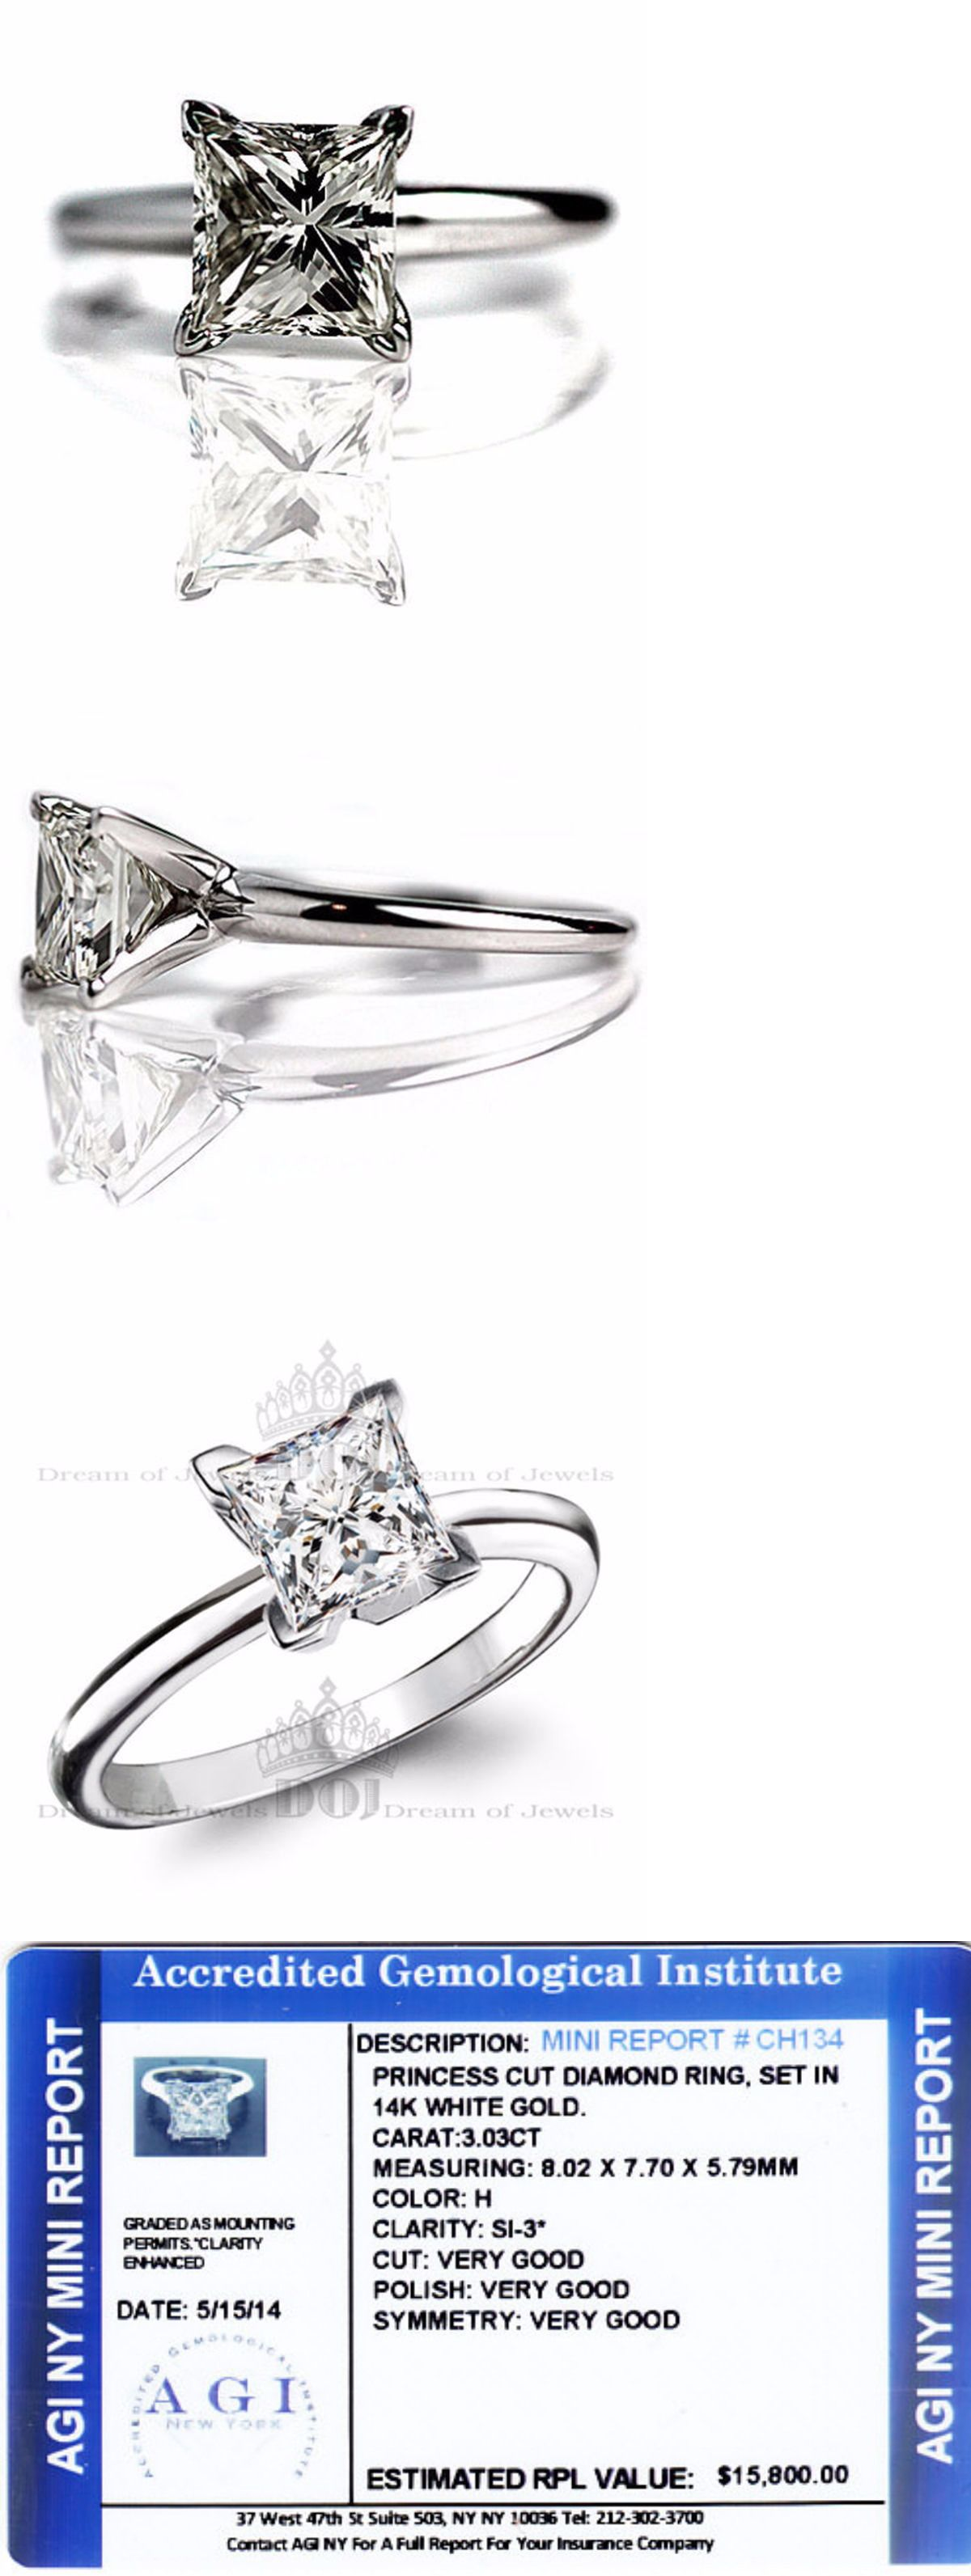 ebay wedding rings sets Wedding rings Princess Cut Diamond Ring 3 04 Carat Set In 14K White Gold Engagement Solitaire